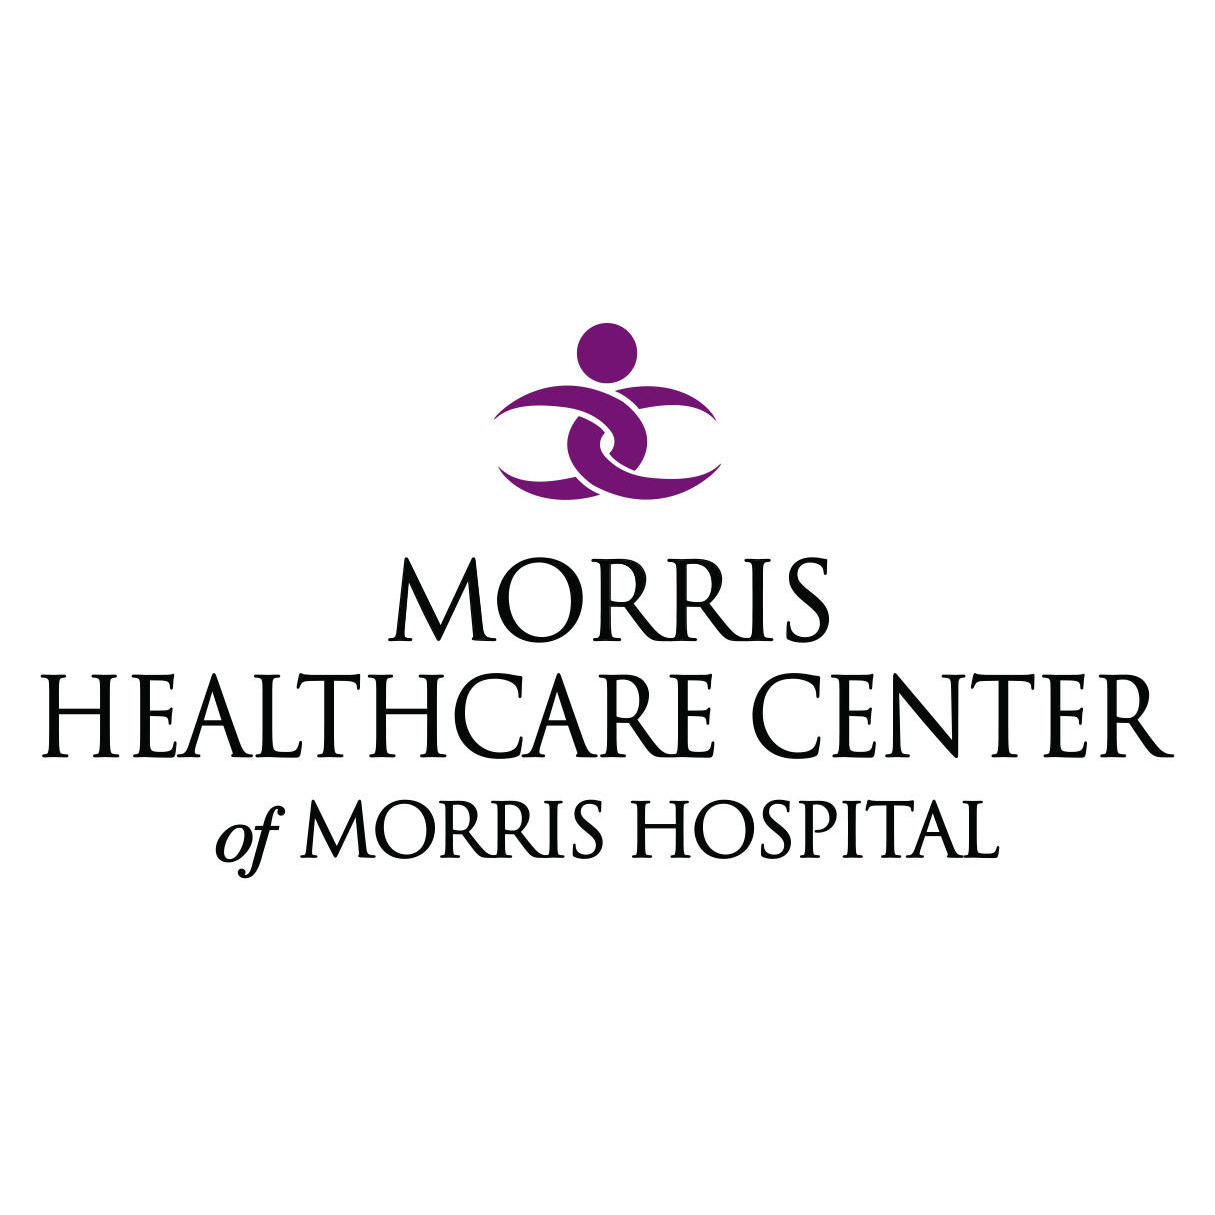 Morris Healthcare Center of Morris Hospital - East Route 6 image 2